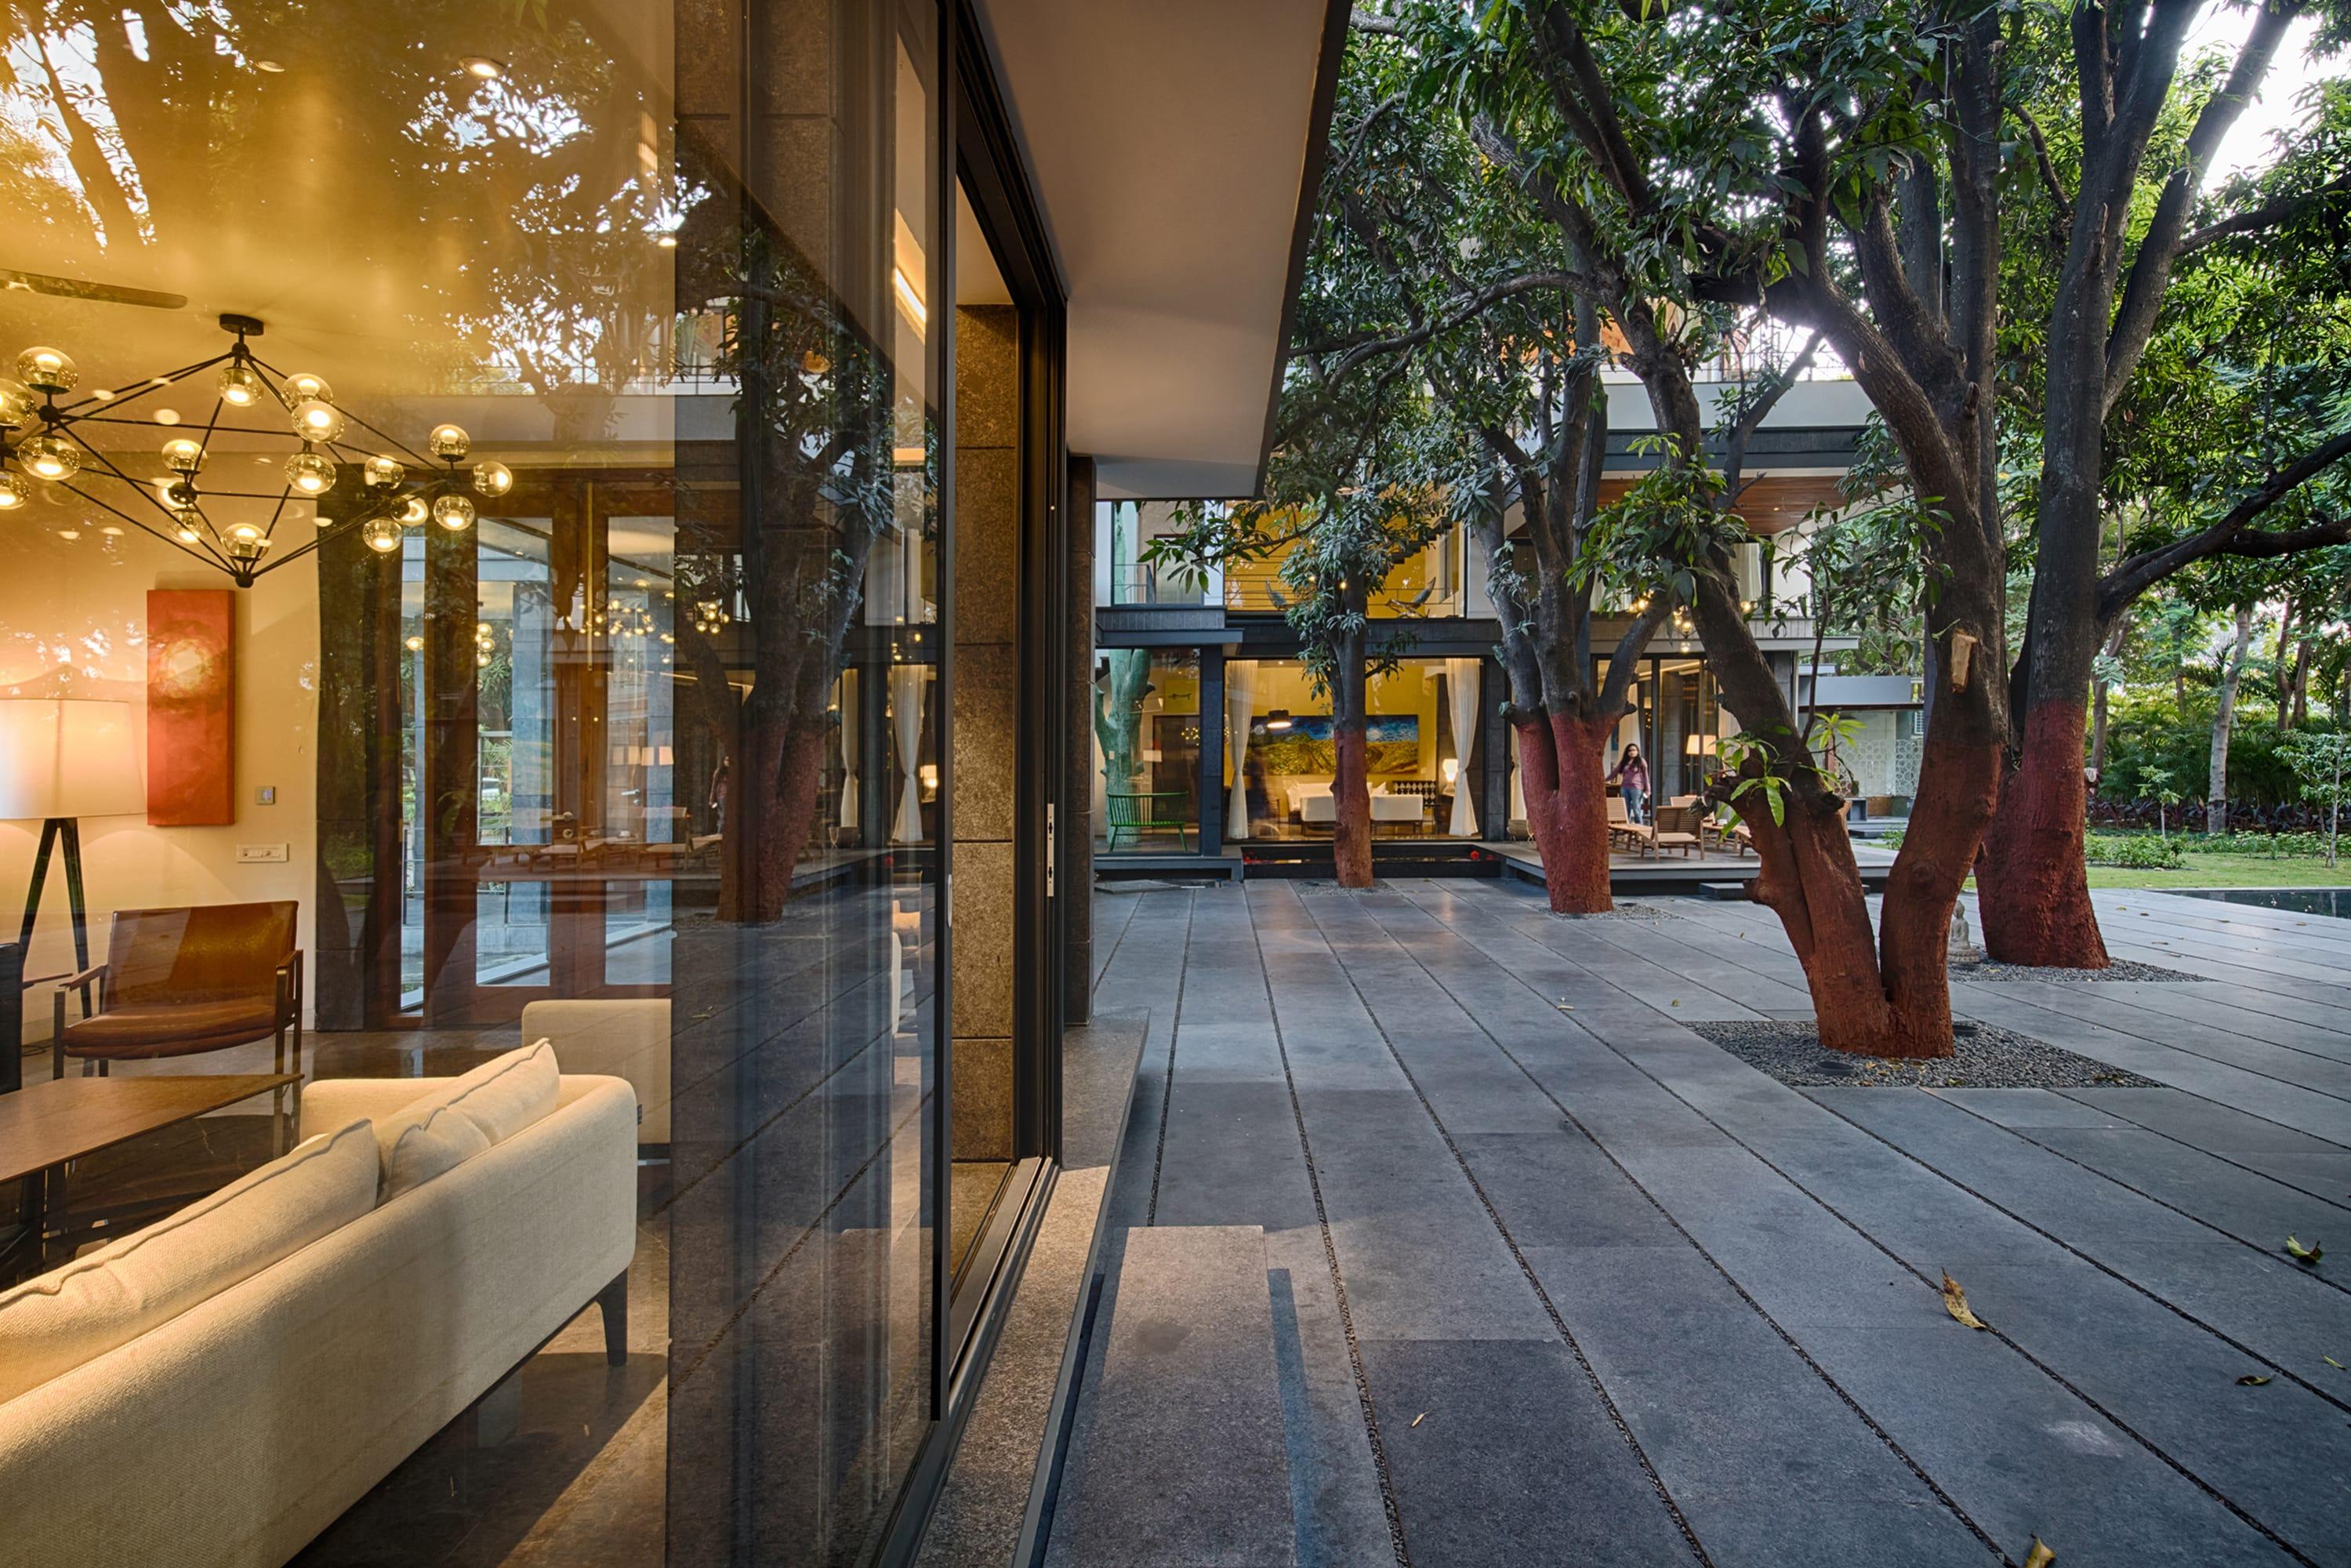 Kinny Soni & Ujjval Panchal · The Mango Tree House, Bhopal